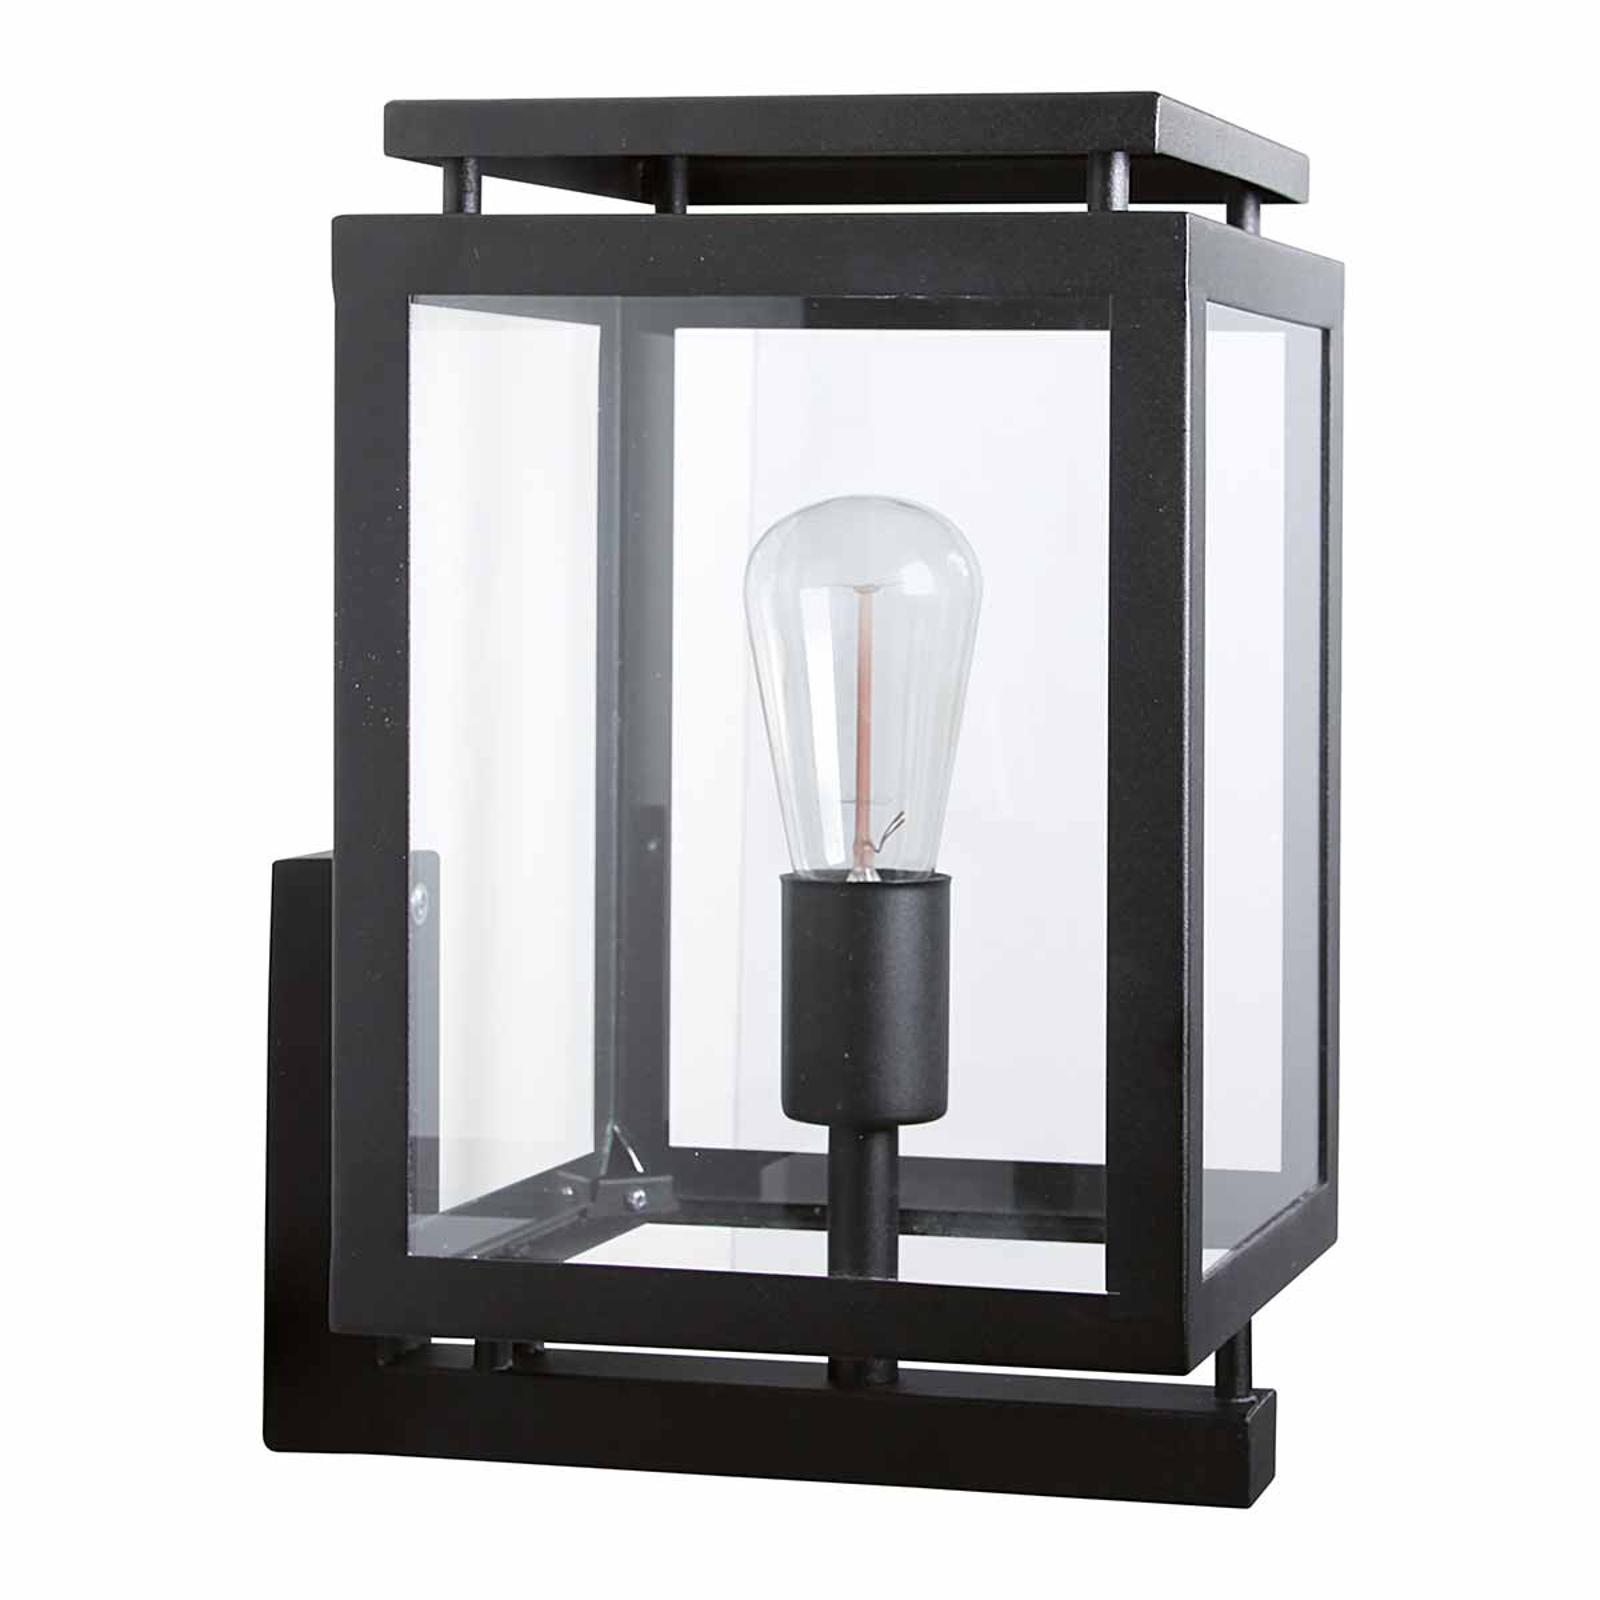 Buitenwandlamp DE Vecht, 37 cm, zwart